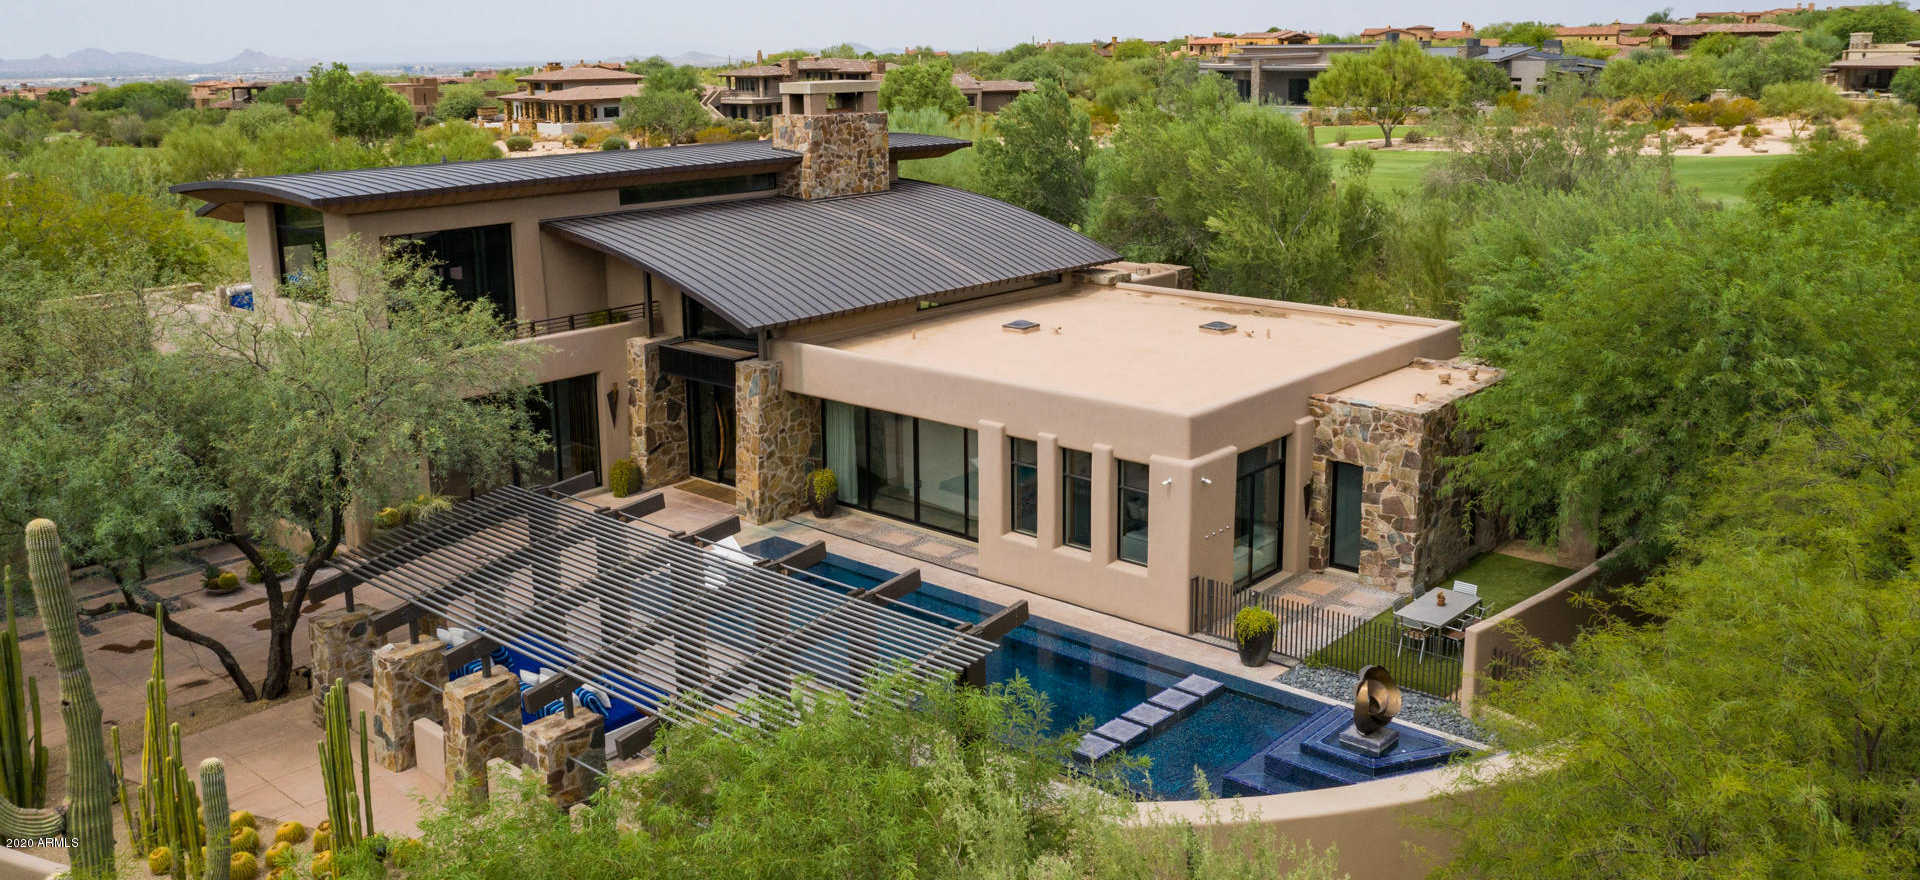 $5,495,000 - 4Br/6Ba - Home for Sale in Dc Ranch Parcel 4.19, Scottsdale